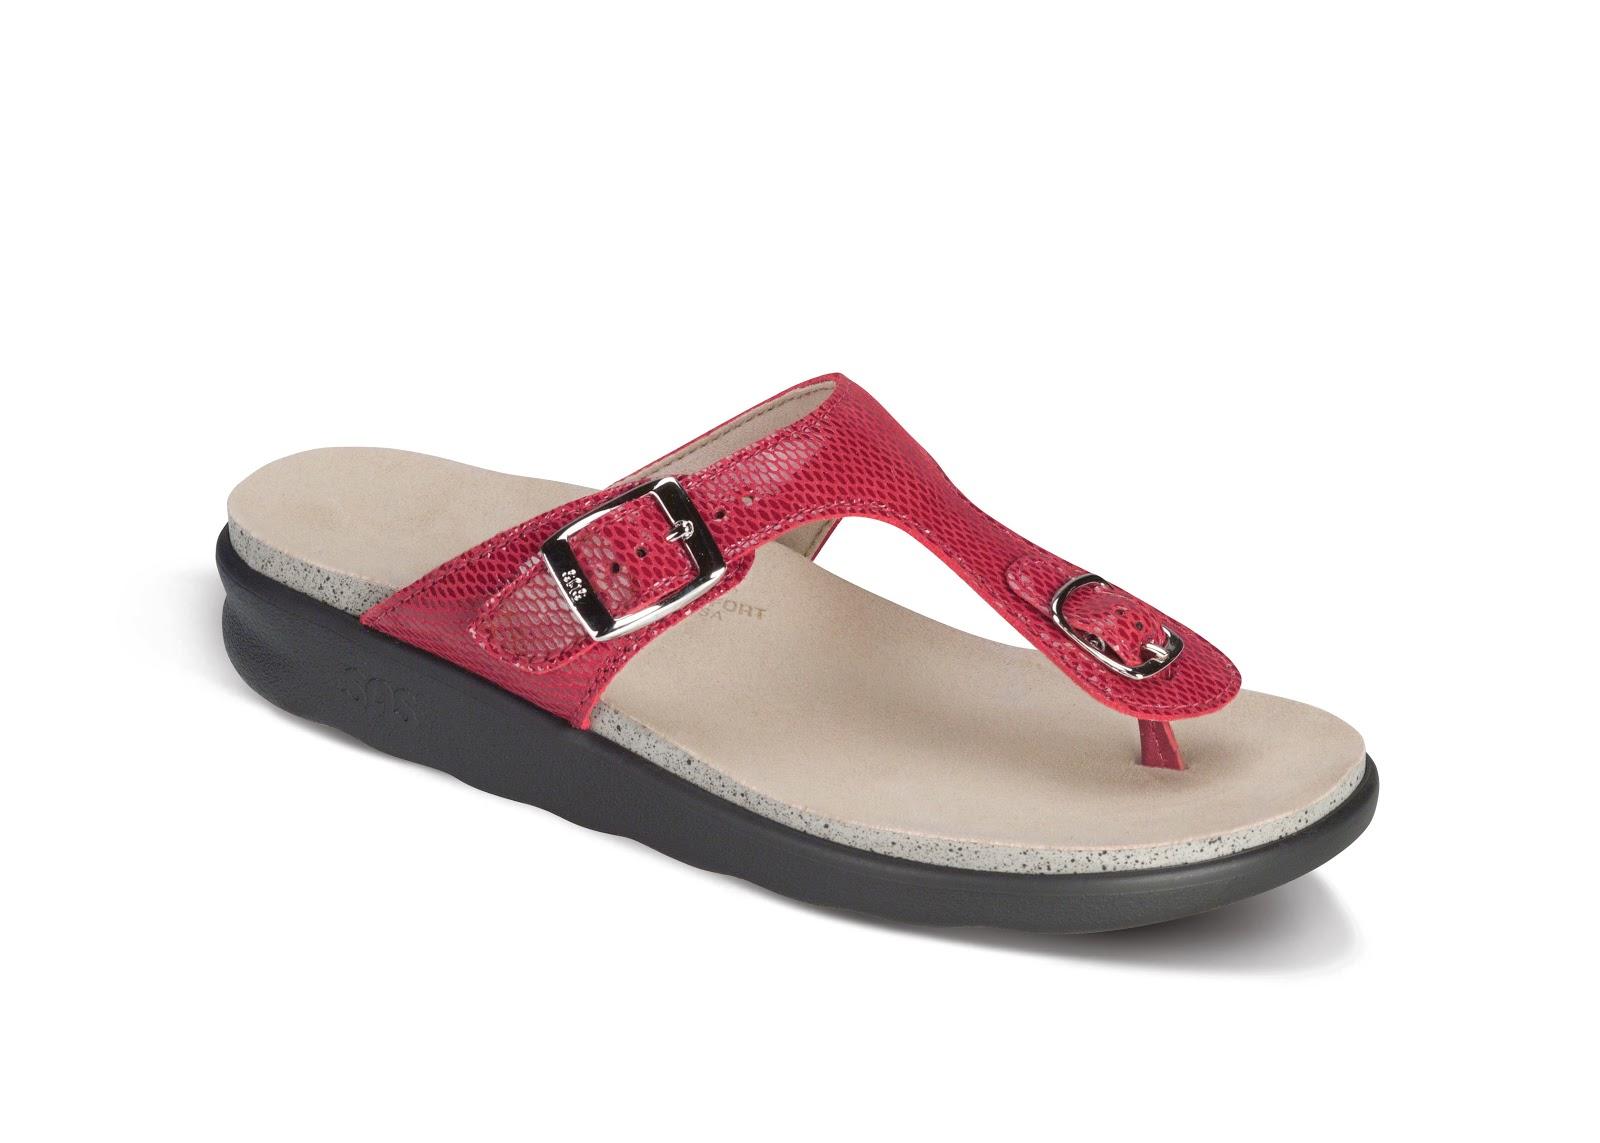 Sas Shoes New Styles